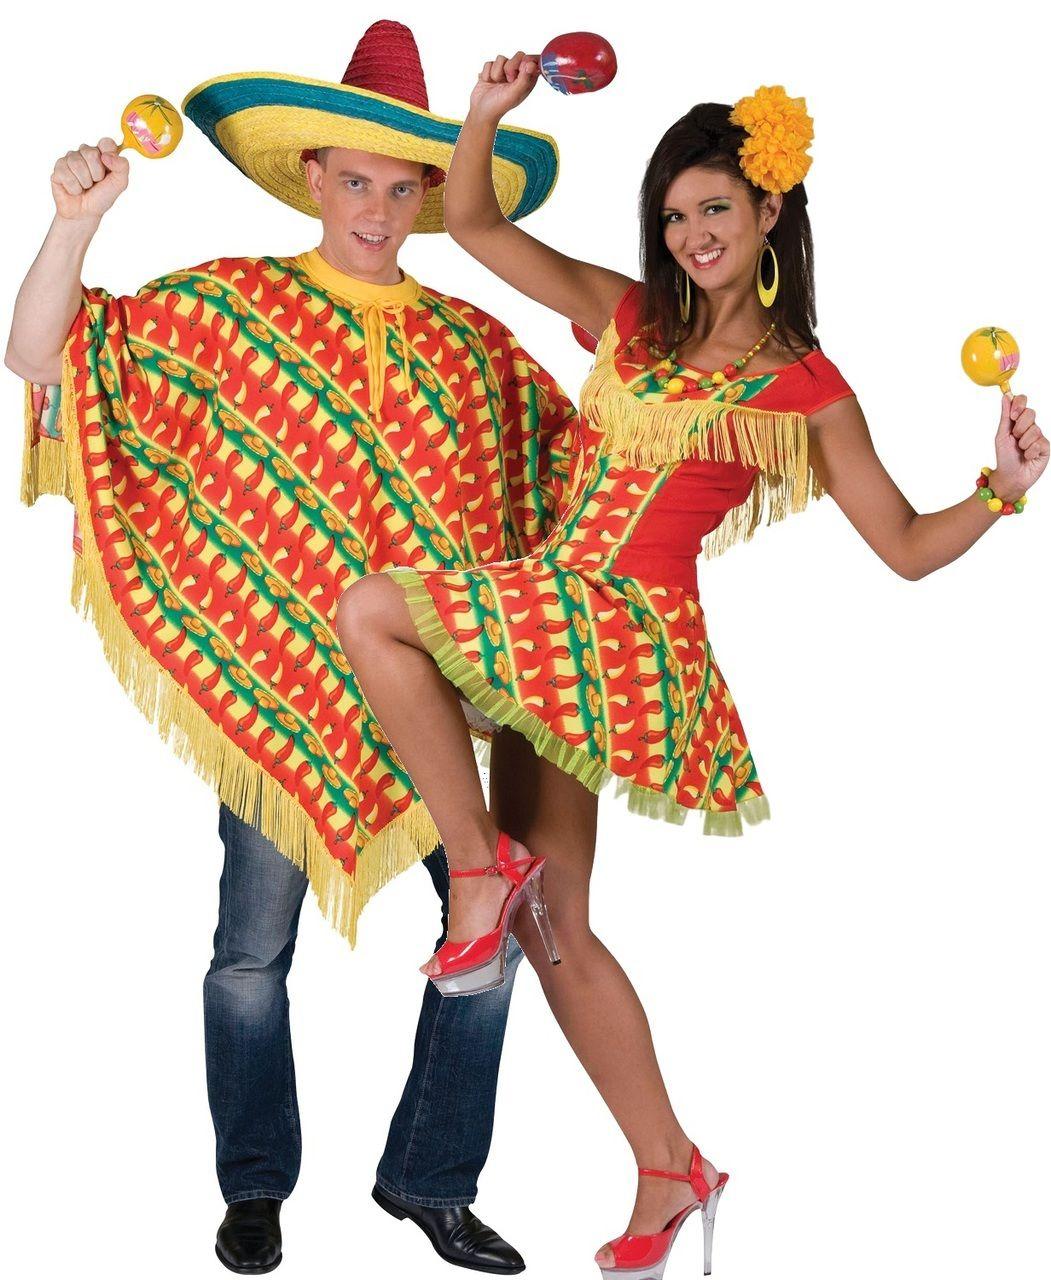 LADY messicana Abito per Fancy Dress Party